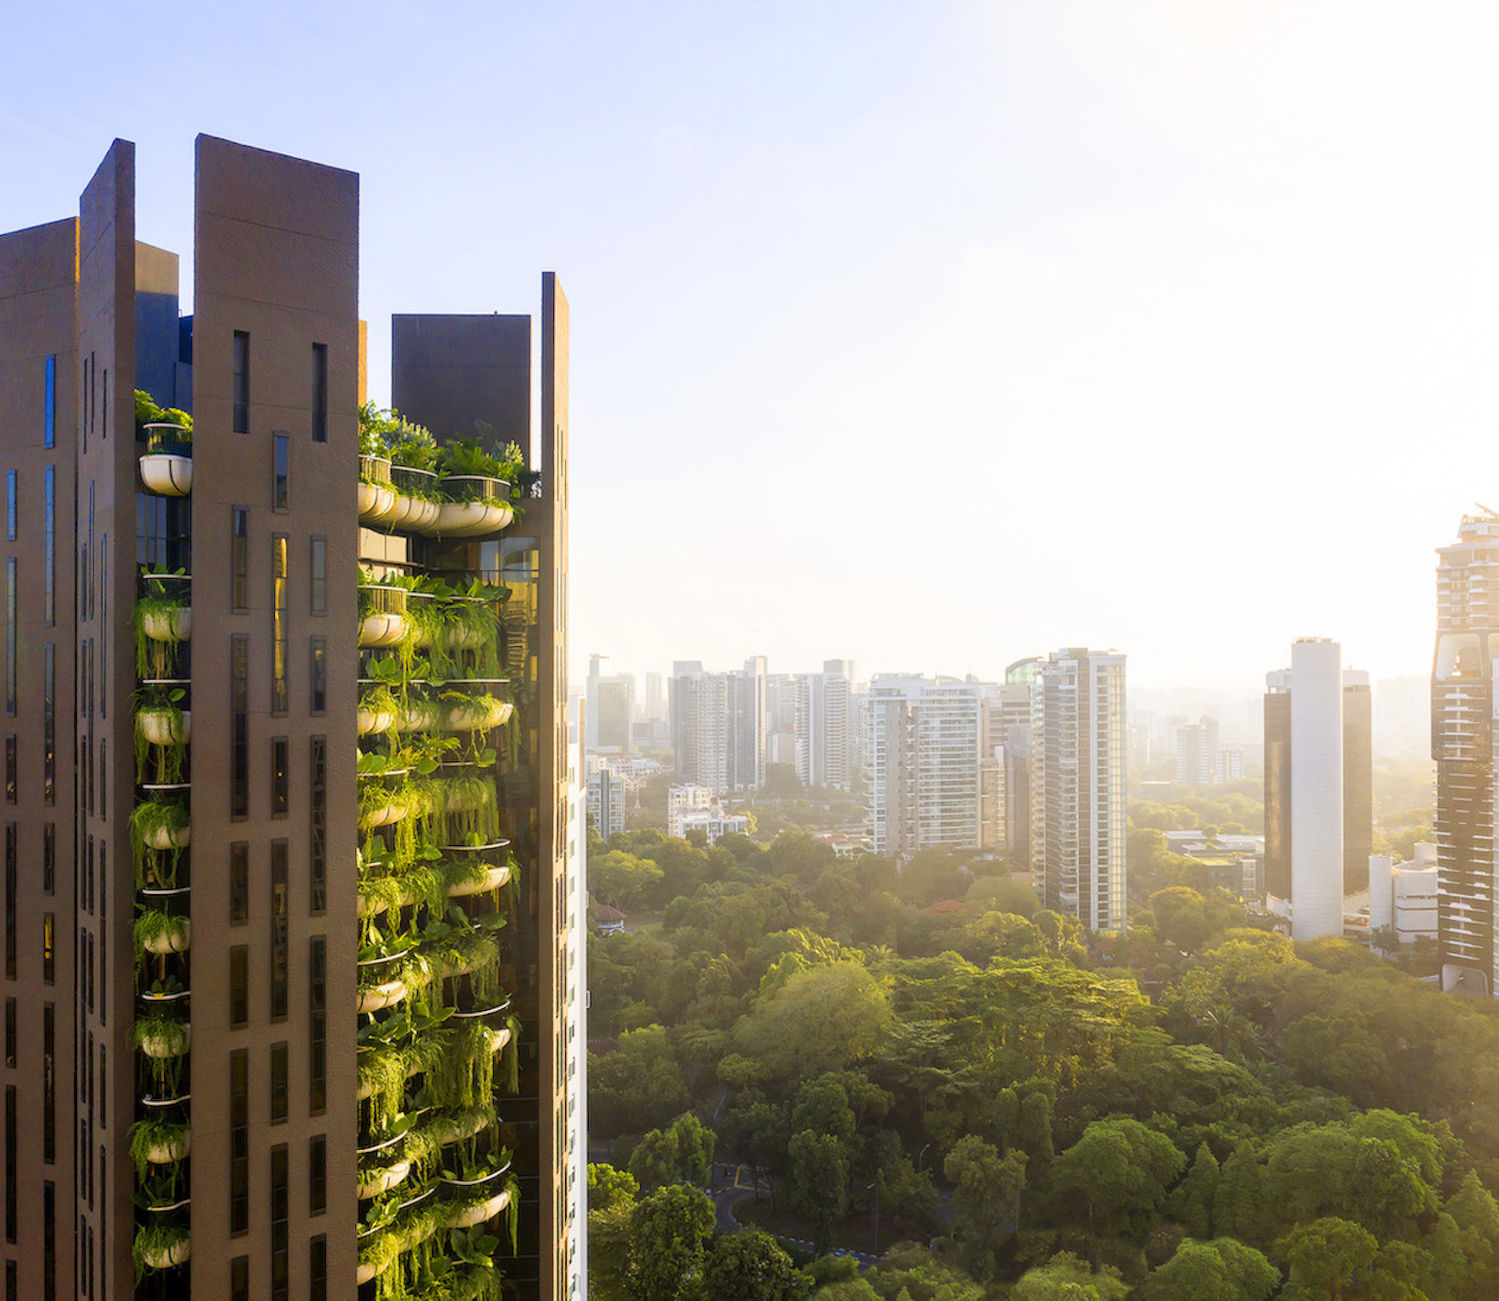 EDEN-by-Swire-Properties - EDGEPROP SINGAPORE